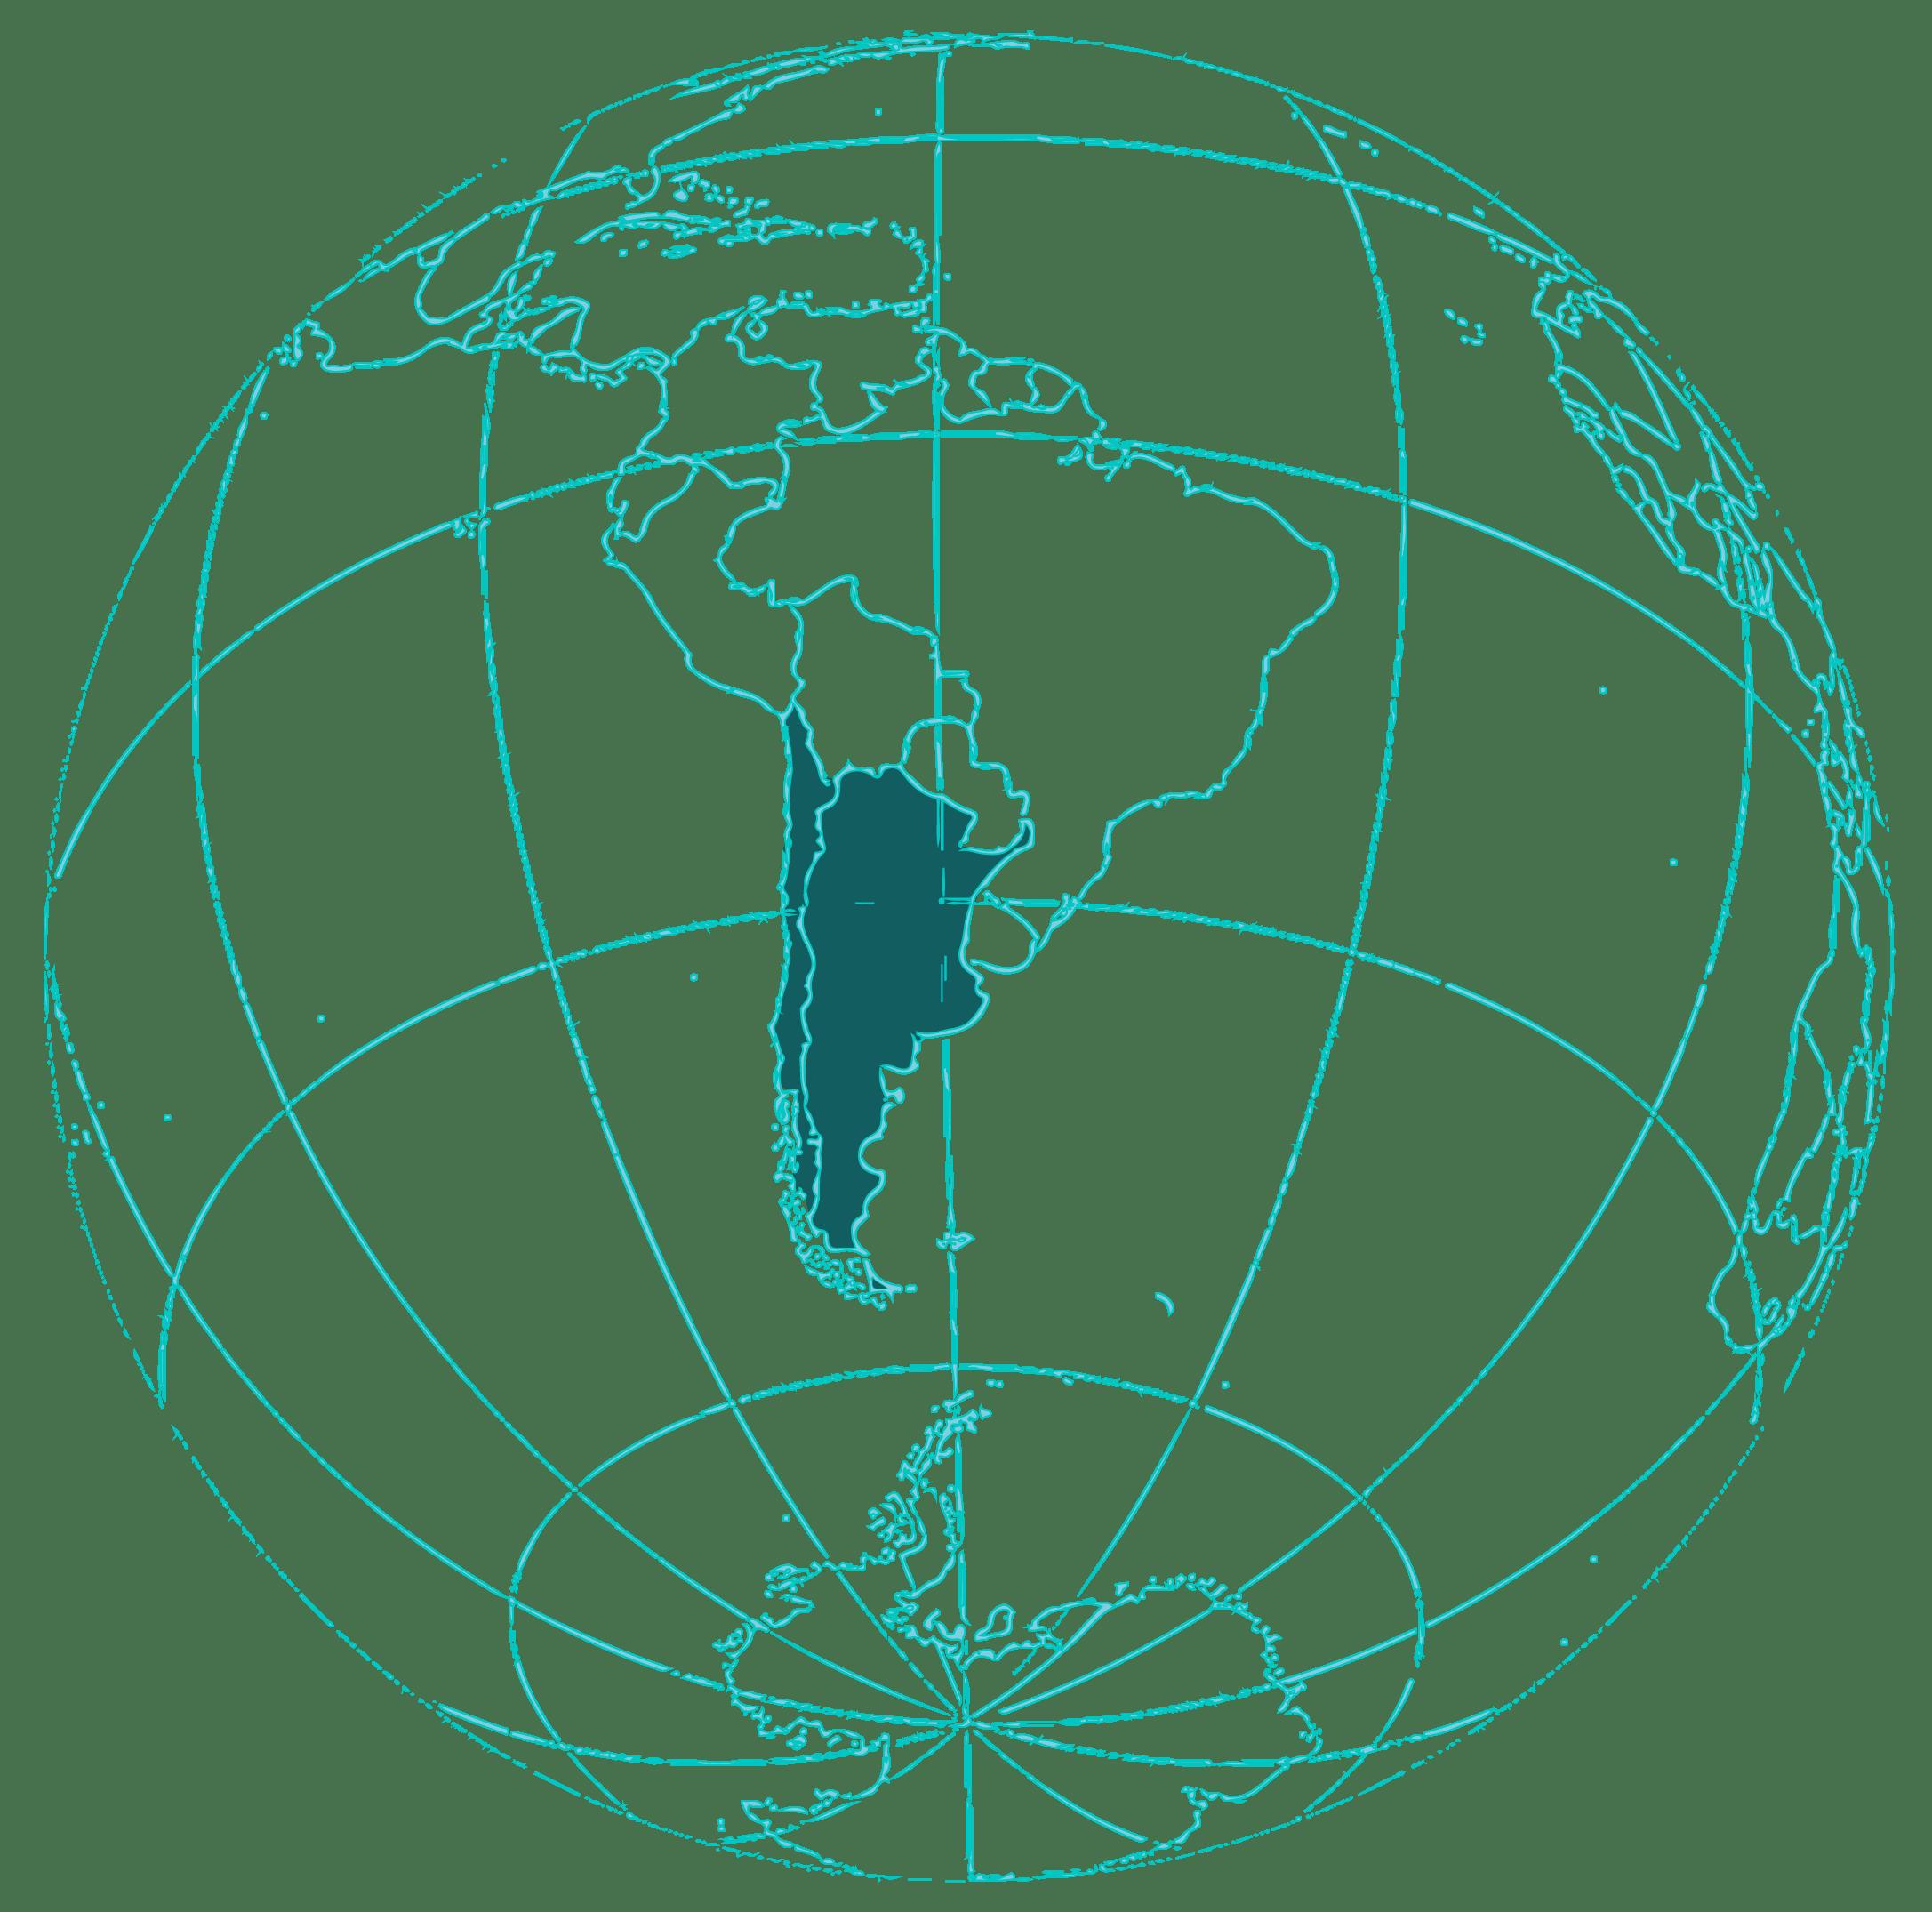 Mapa chile y argentina